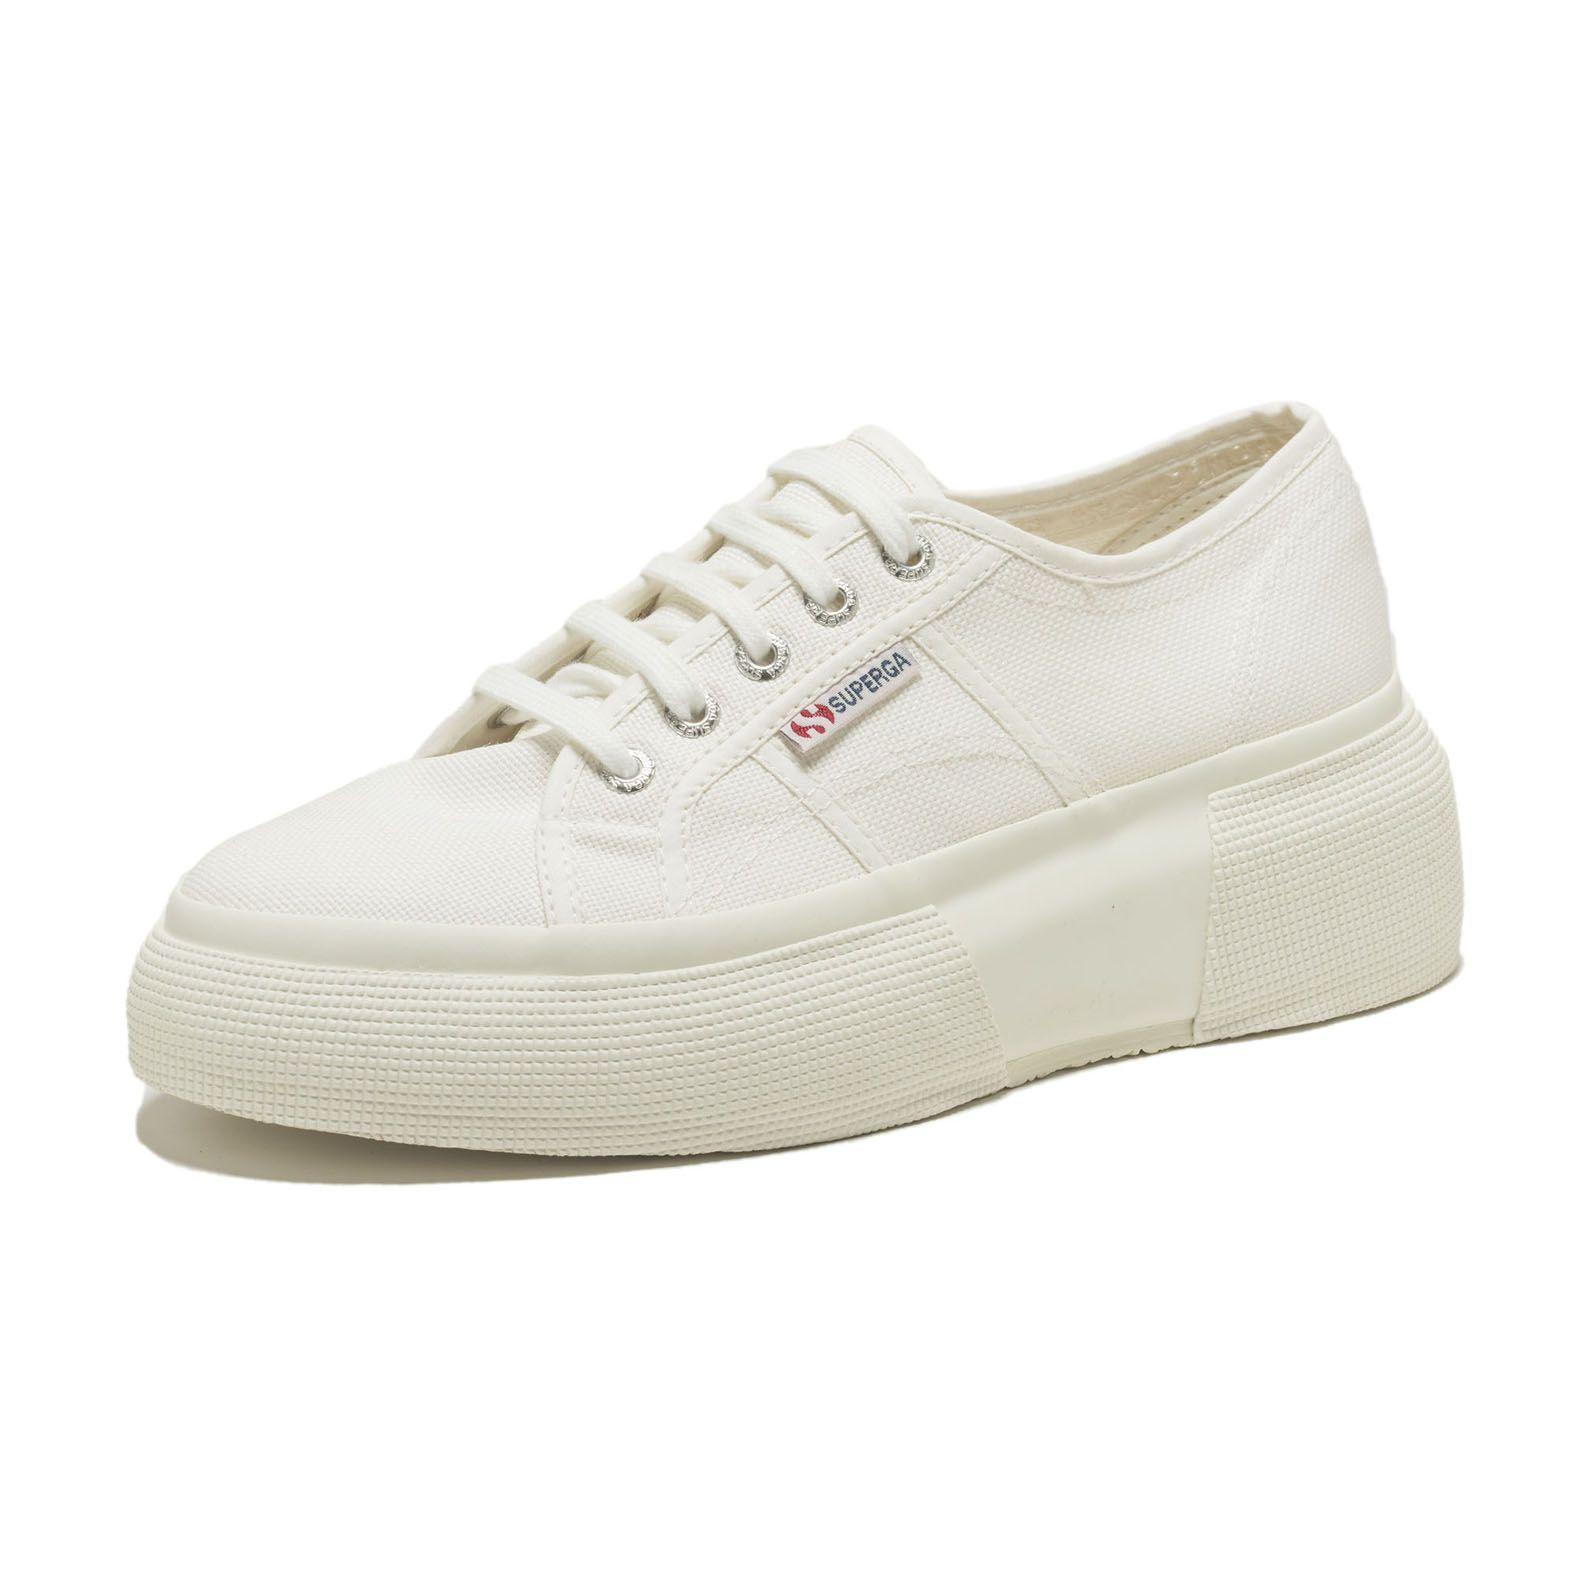 2287 COTU CLASSIC WHITE